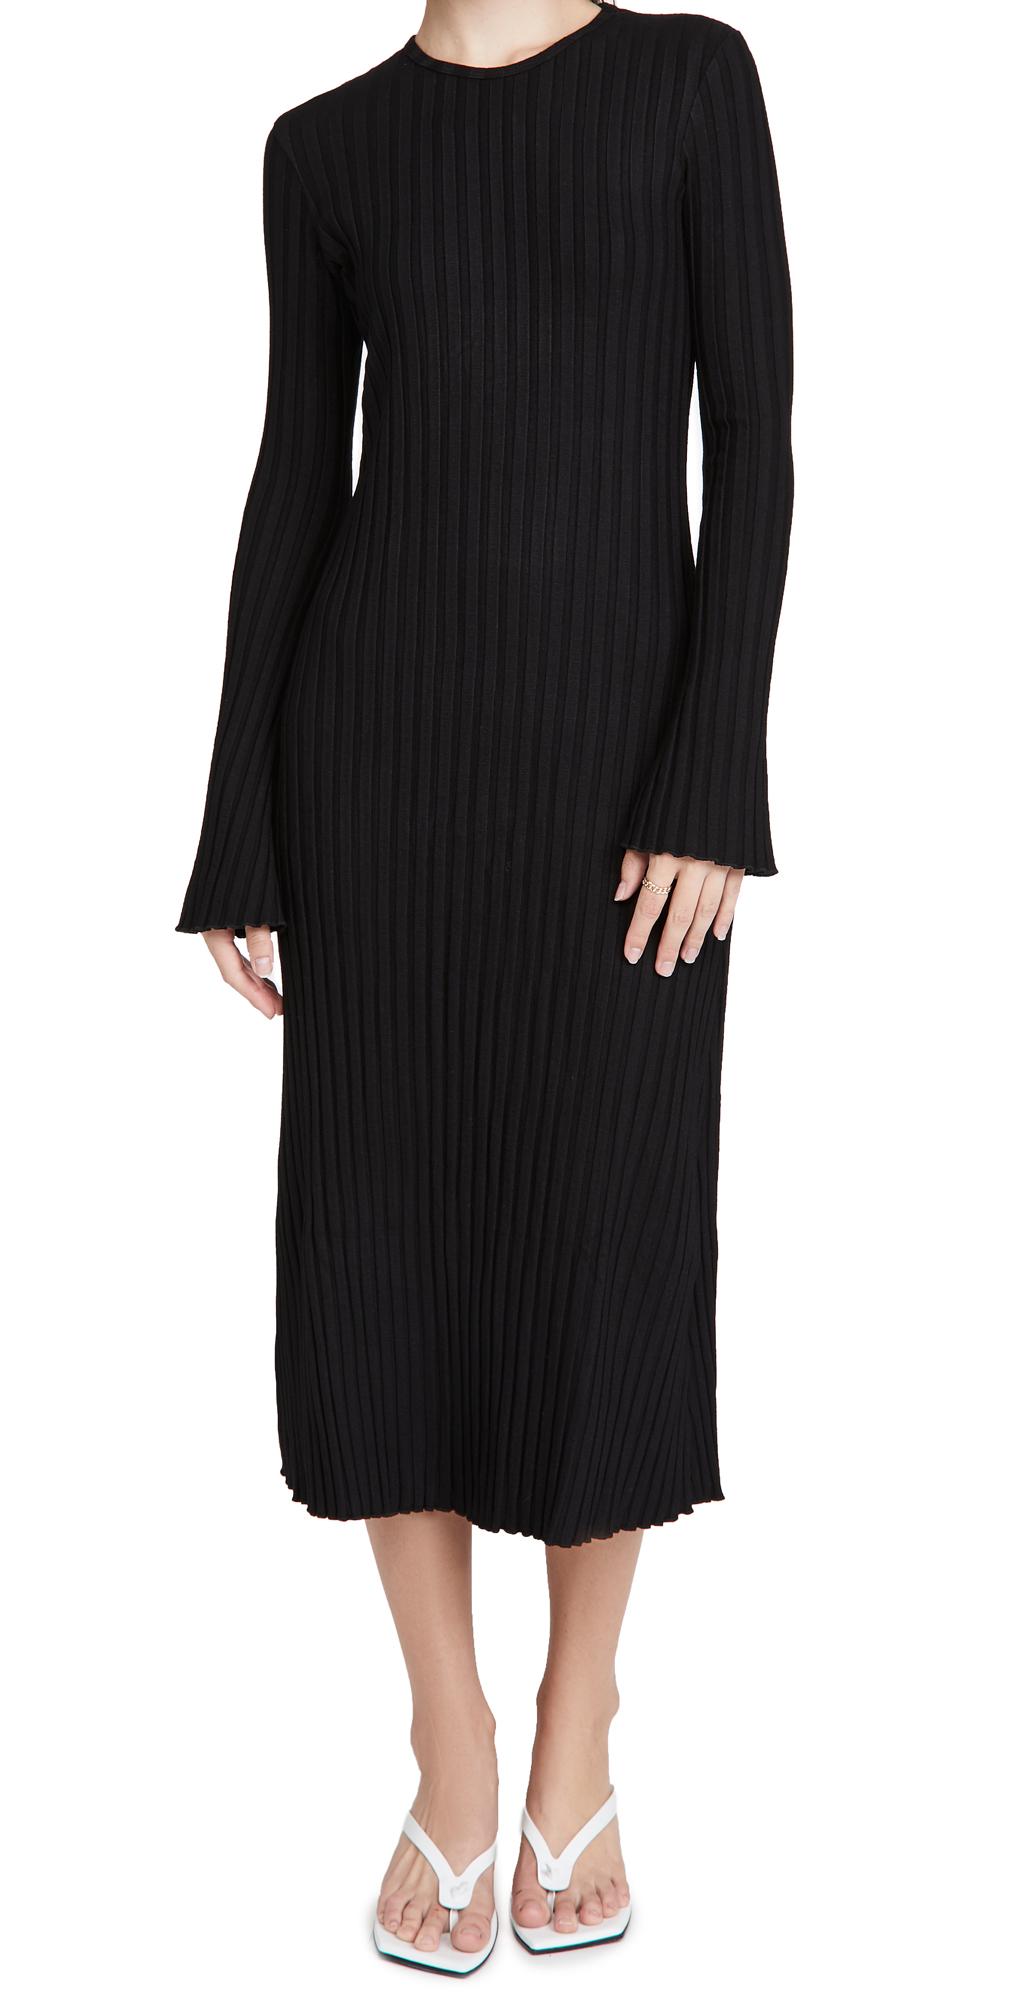 Simon Miller Wells Long Sleeve Dress